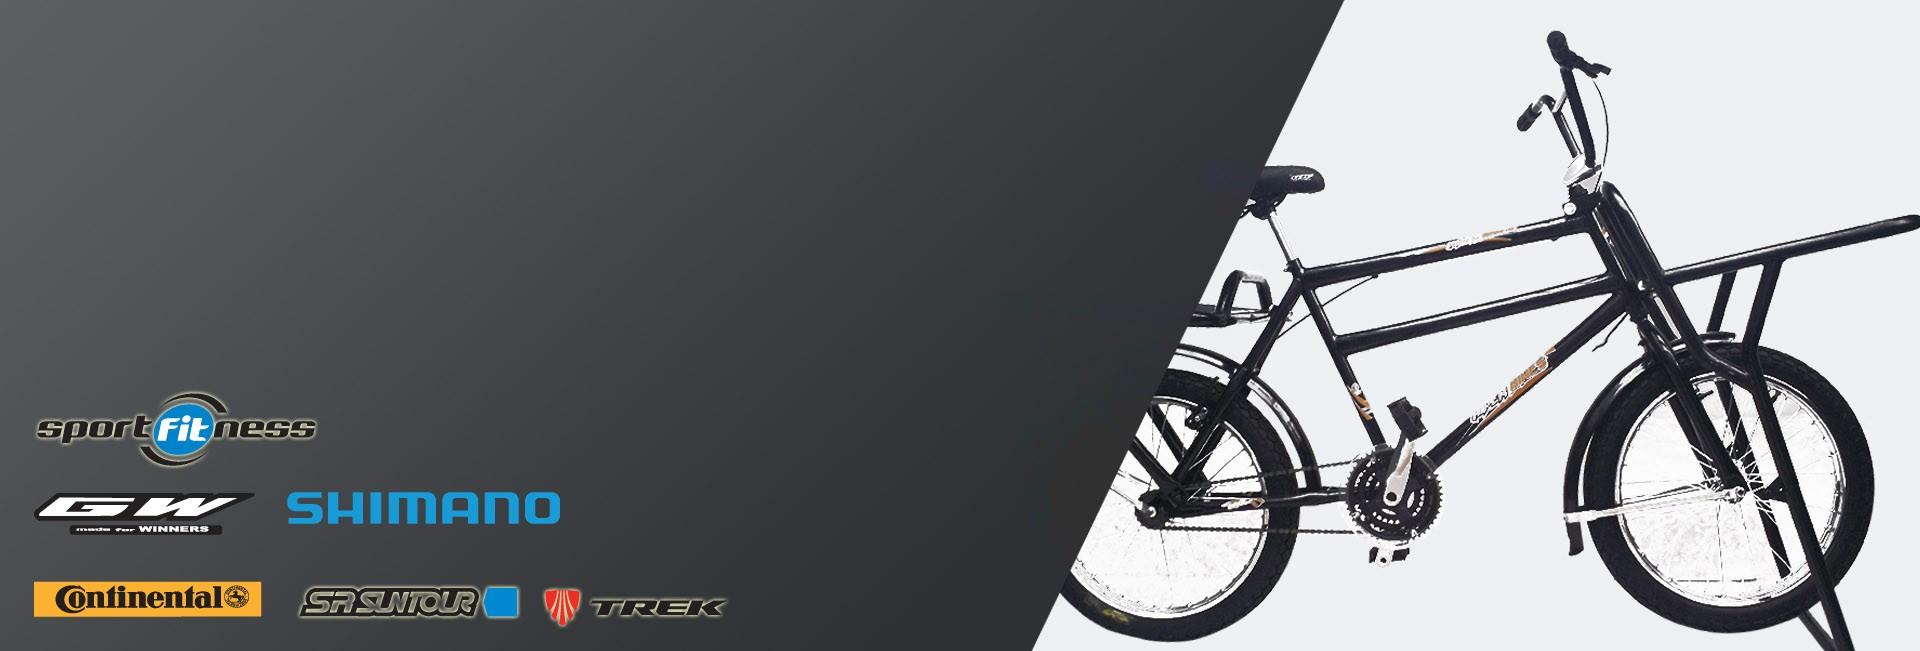 Compre hoy su Bicicleta de carga